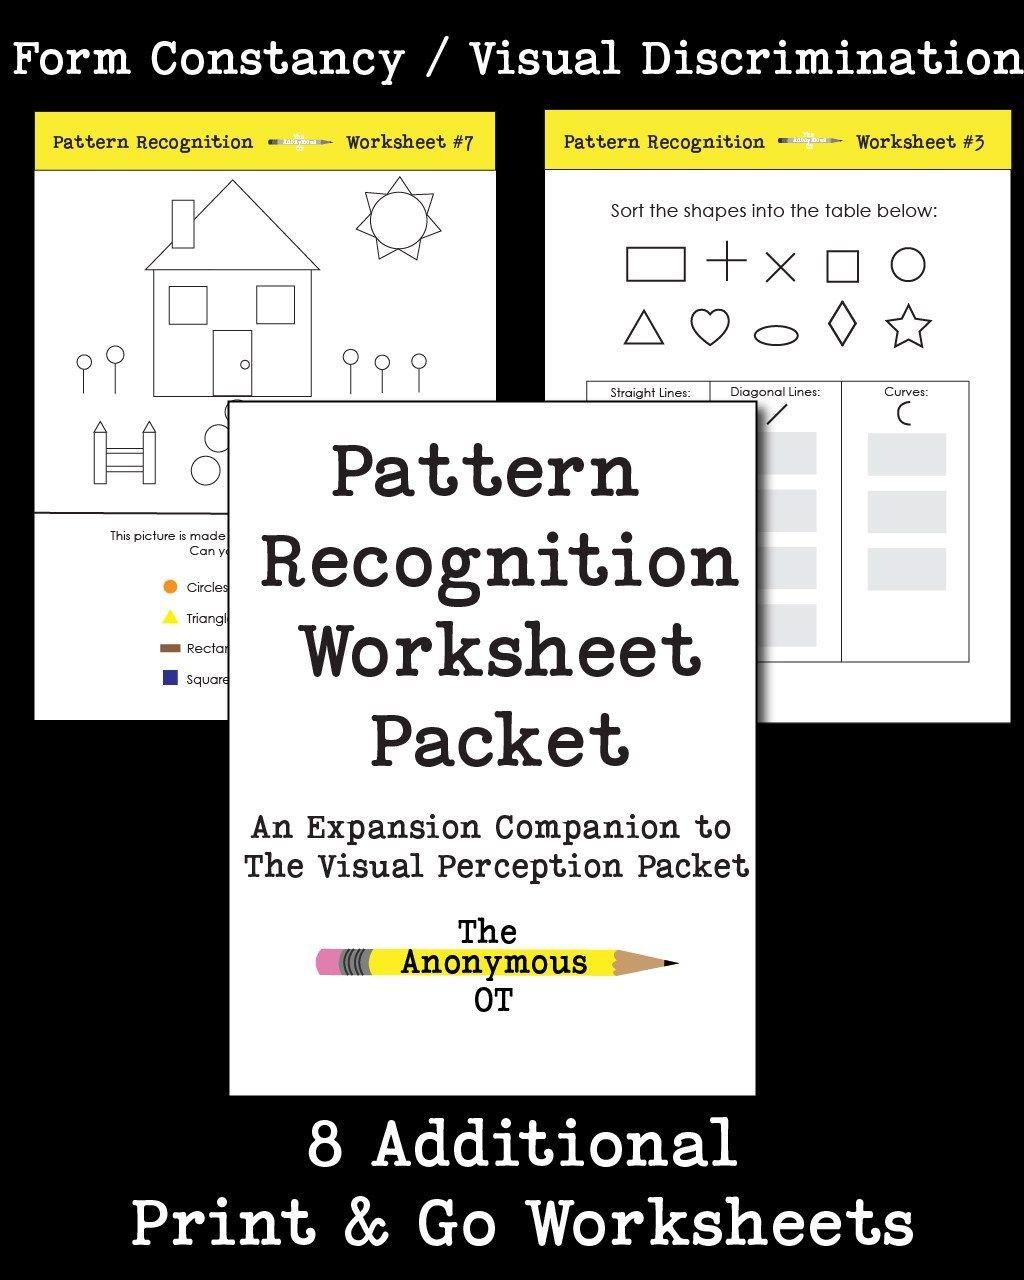 Pattern Recognition Worksheet Packet